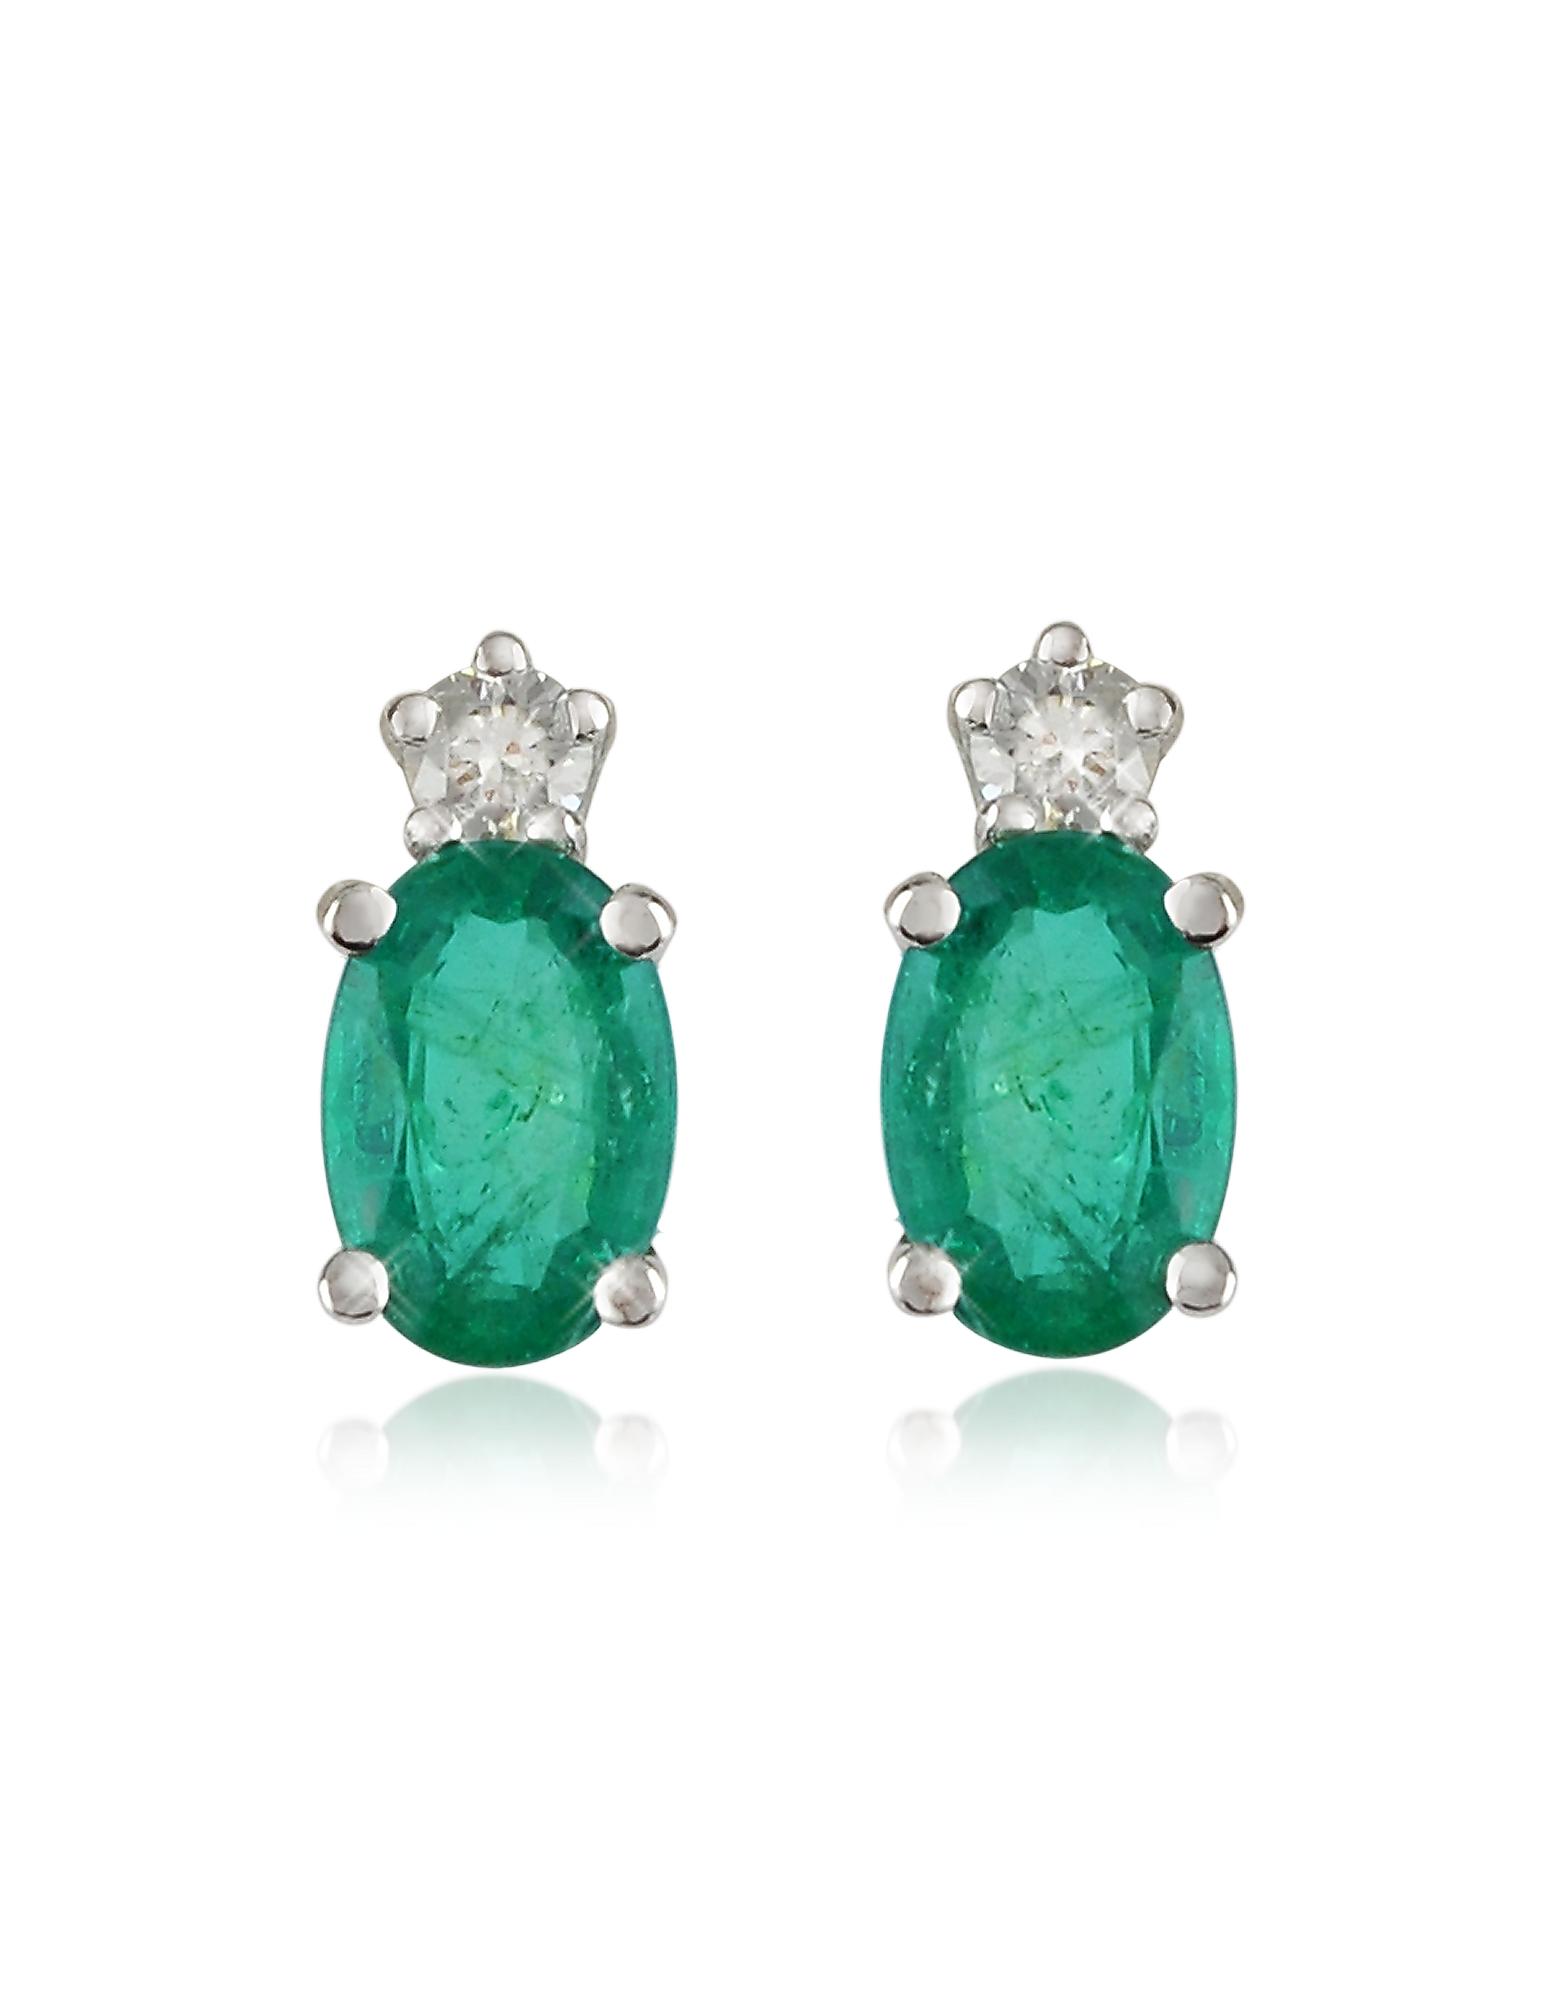 Emerald and Diamond 18K Gold Earrings